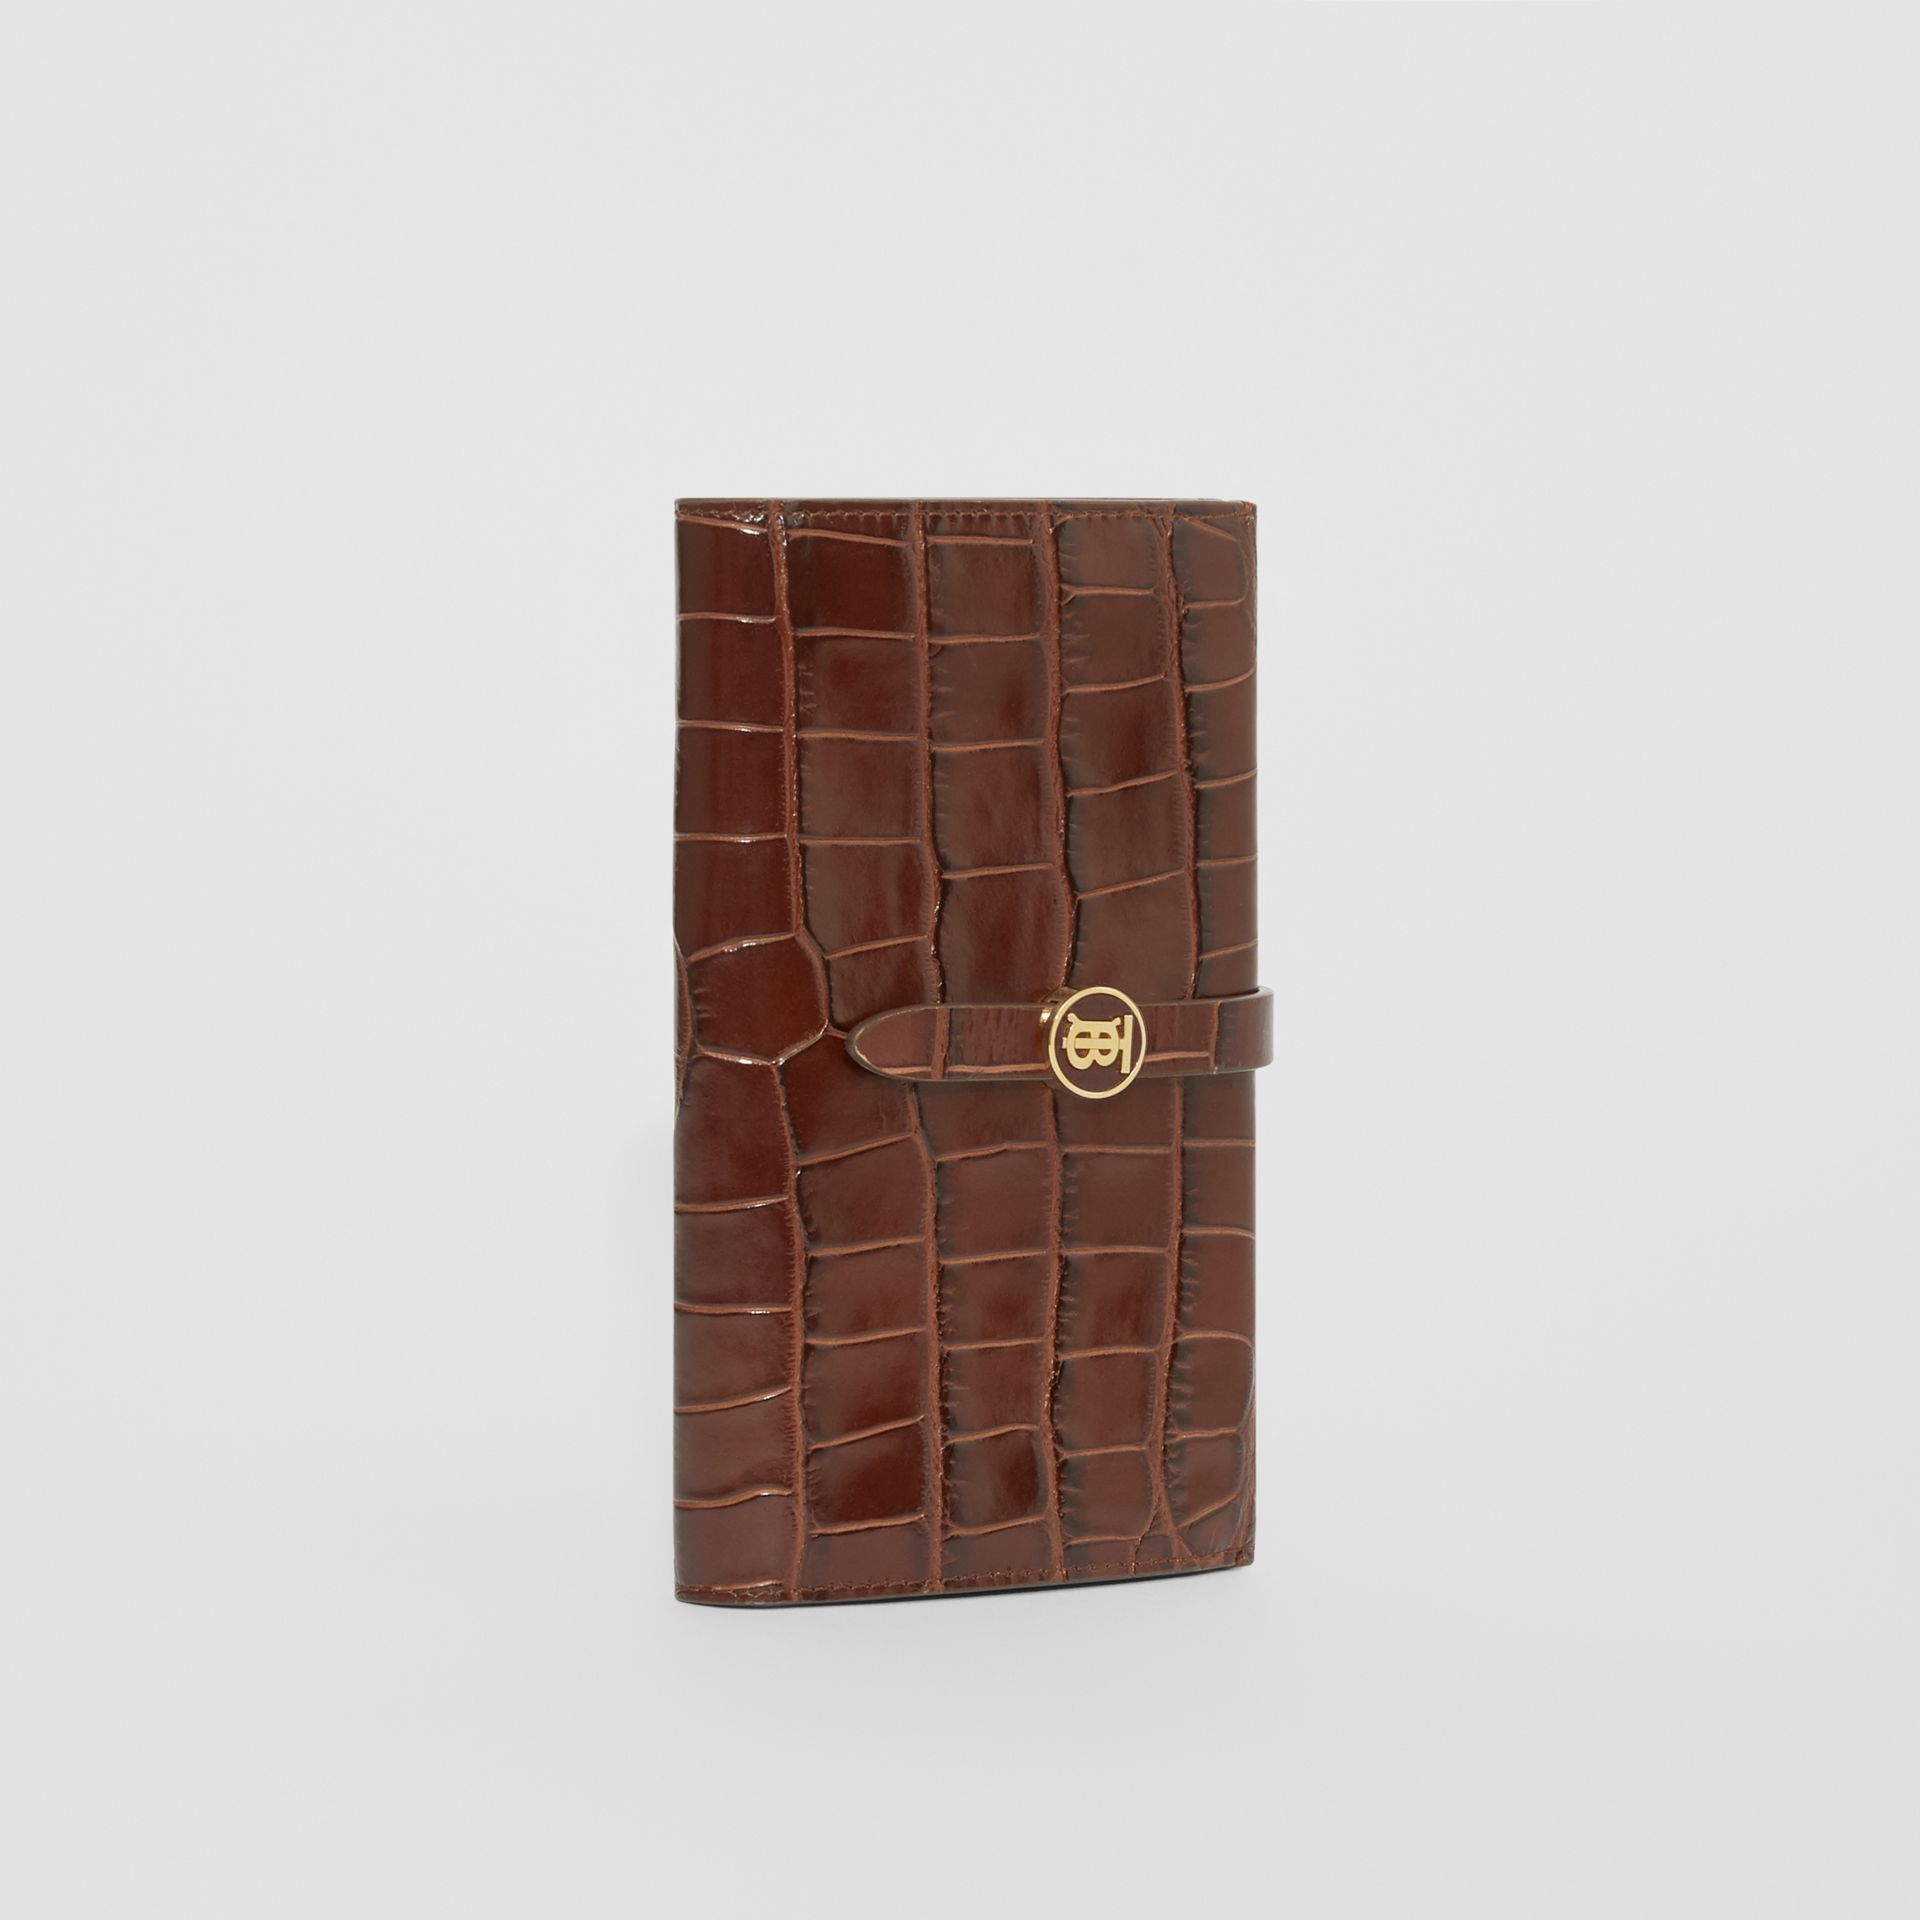 Monogram Motif Embossed Leather Folding Wallet in Tan - Women | Burberry - gallery image 4